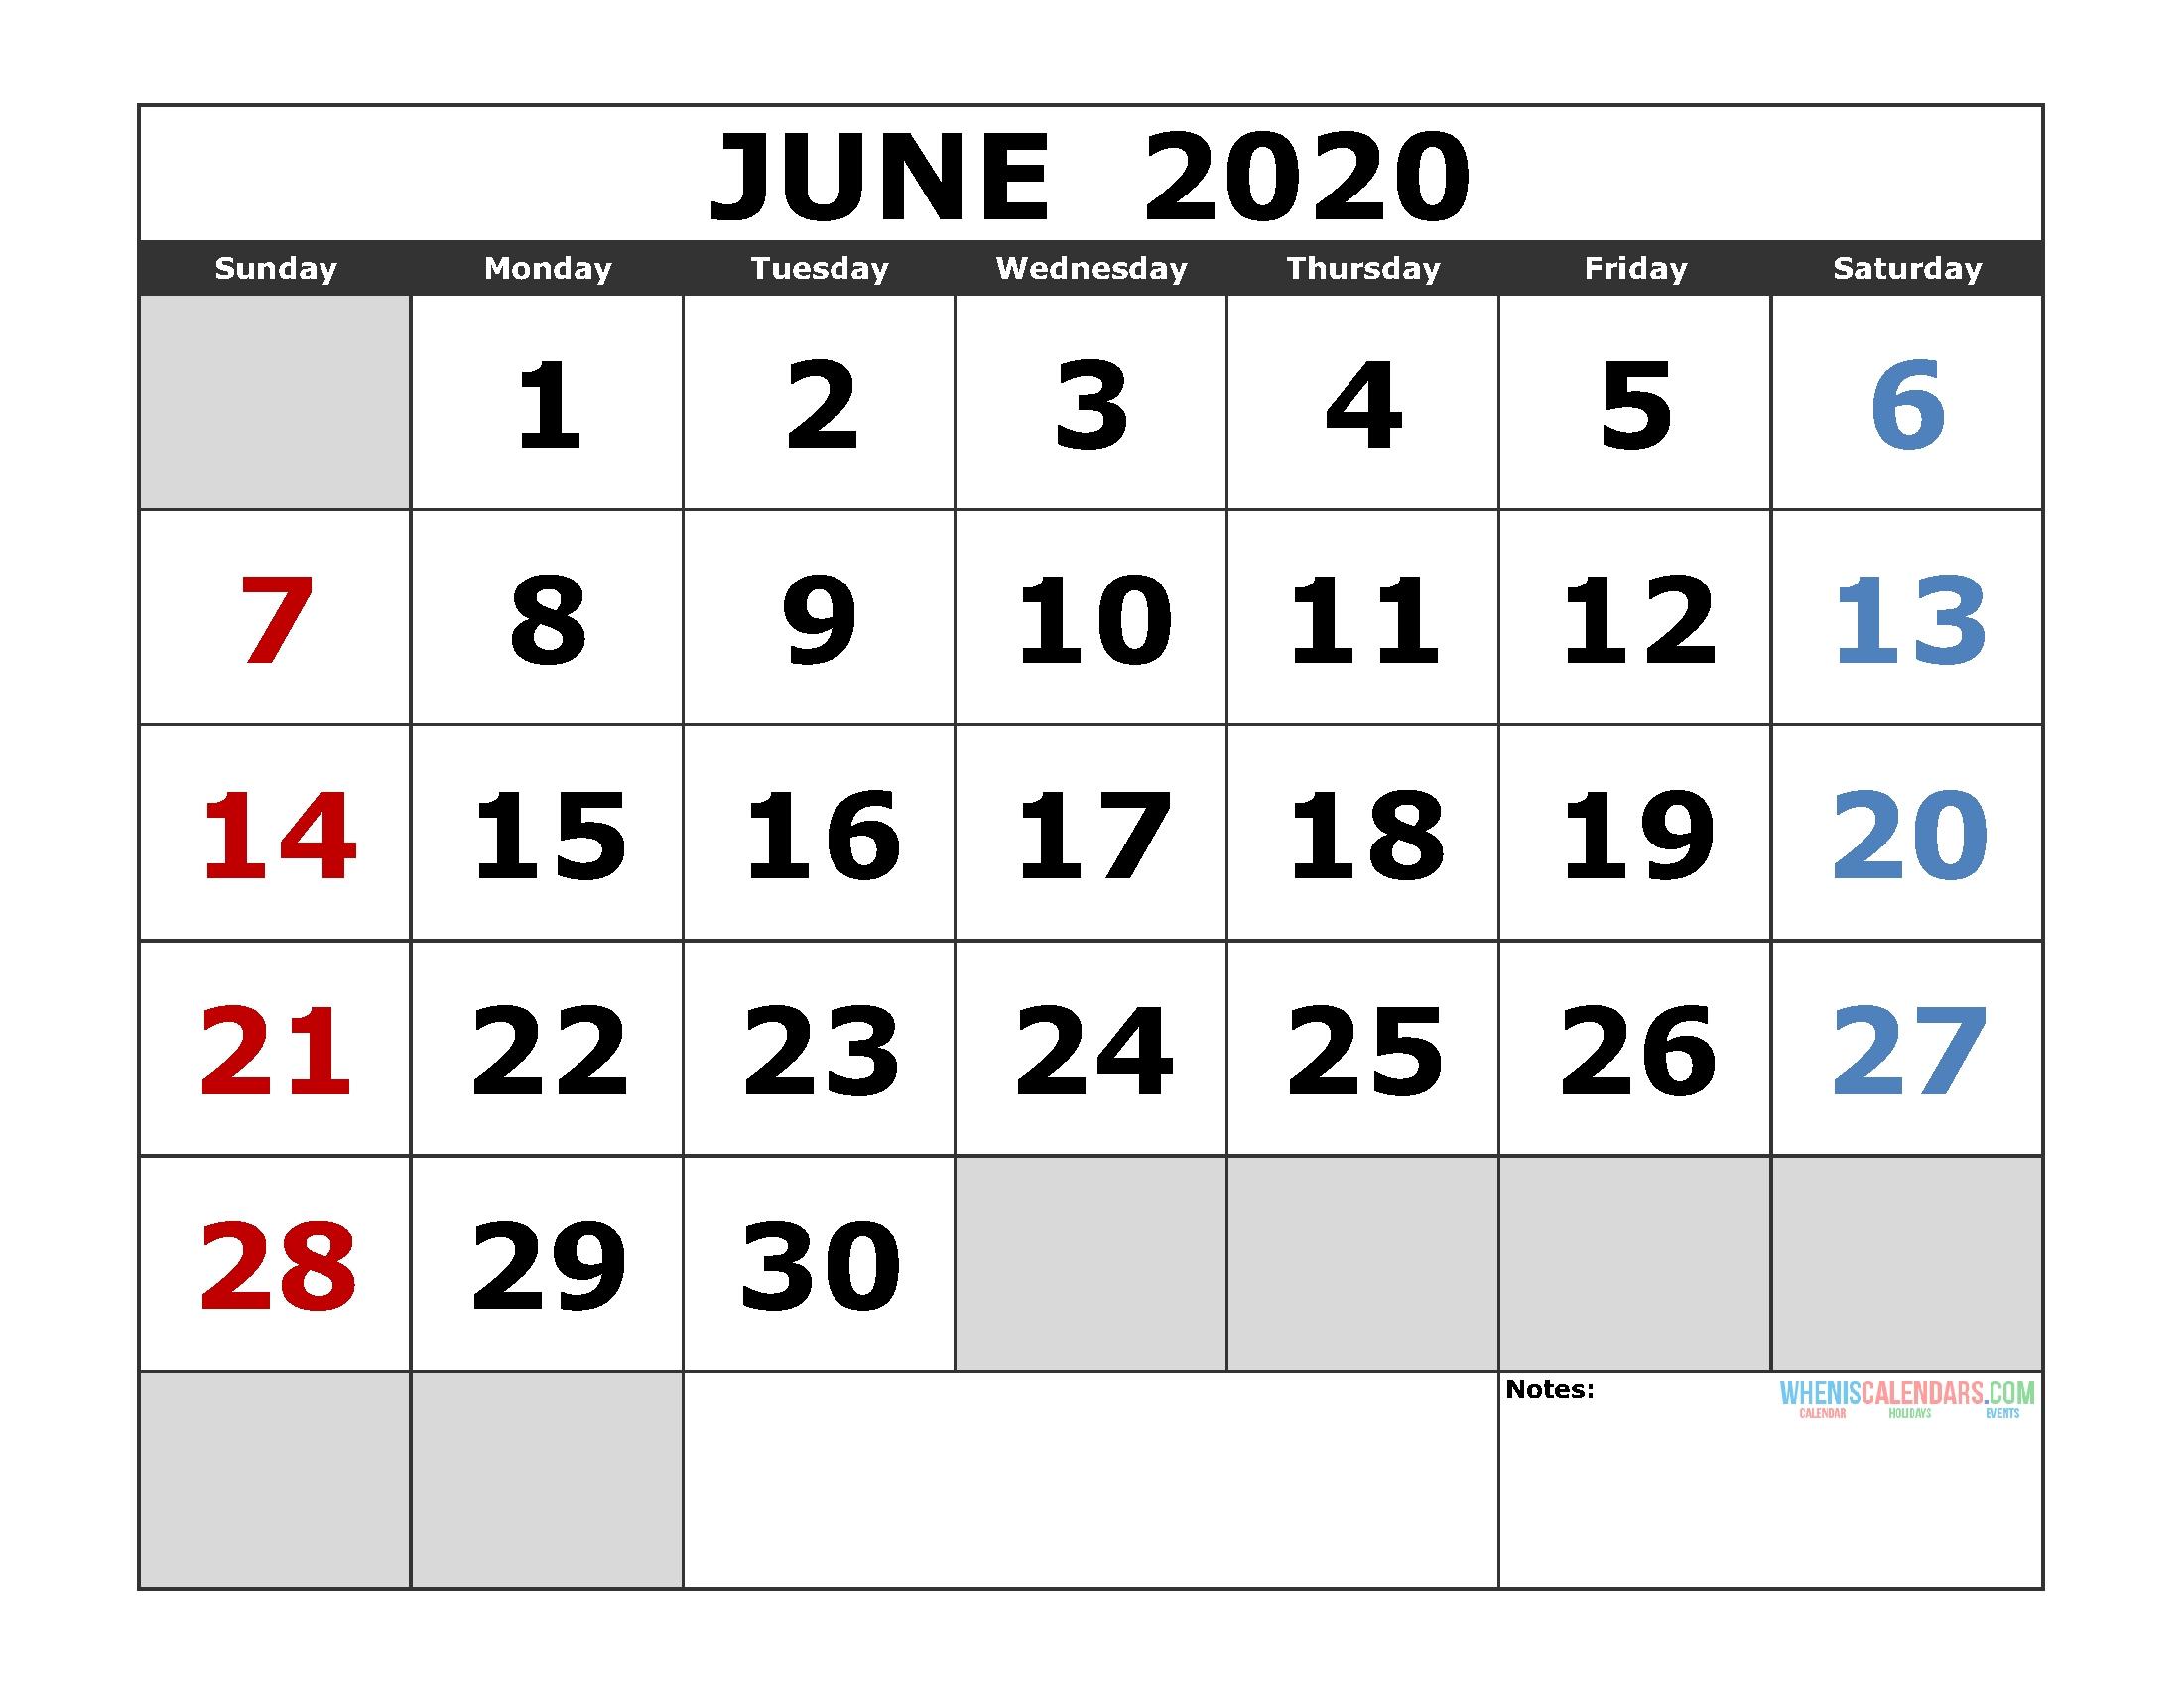 June 2020 Printable Monthly Calendar Template Monday Through